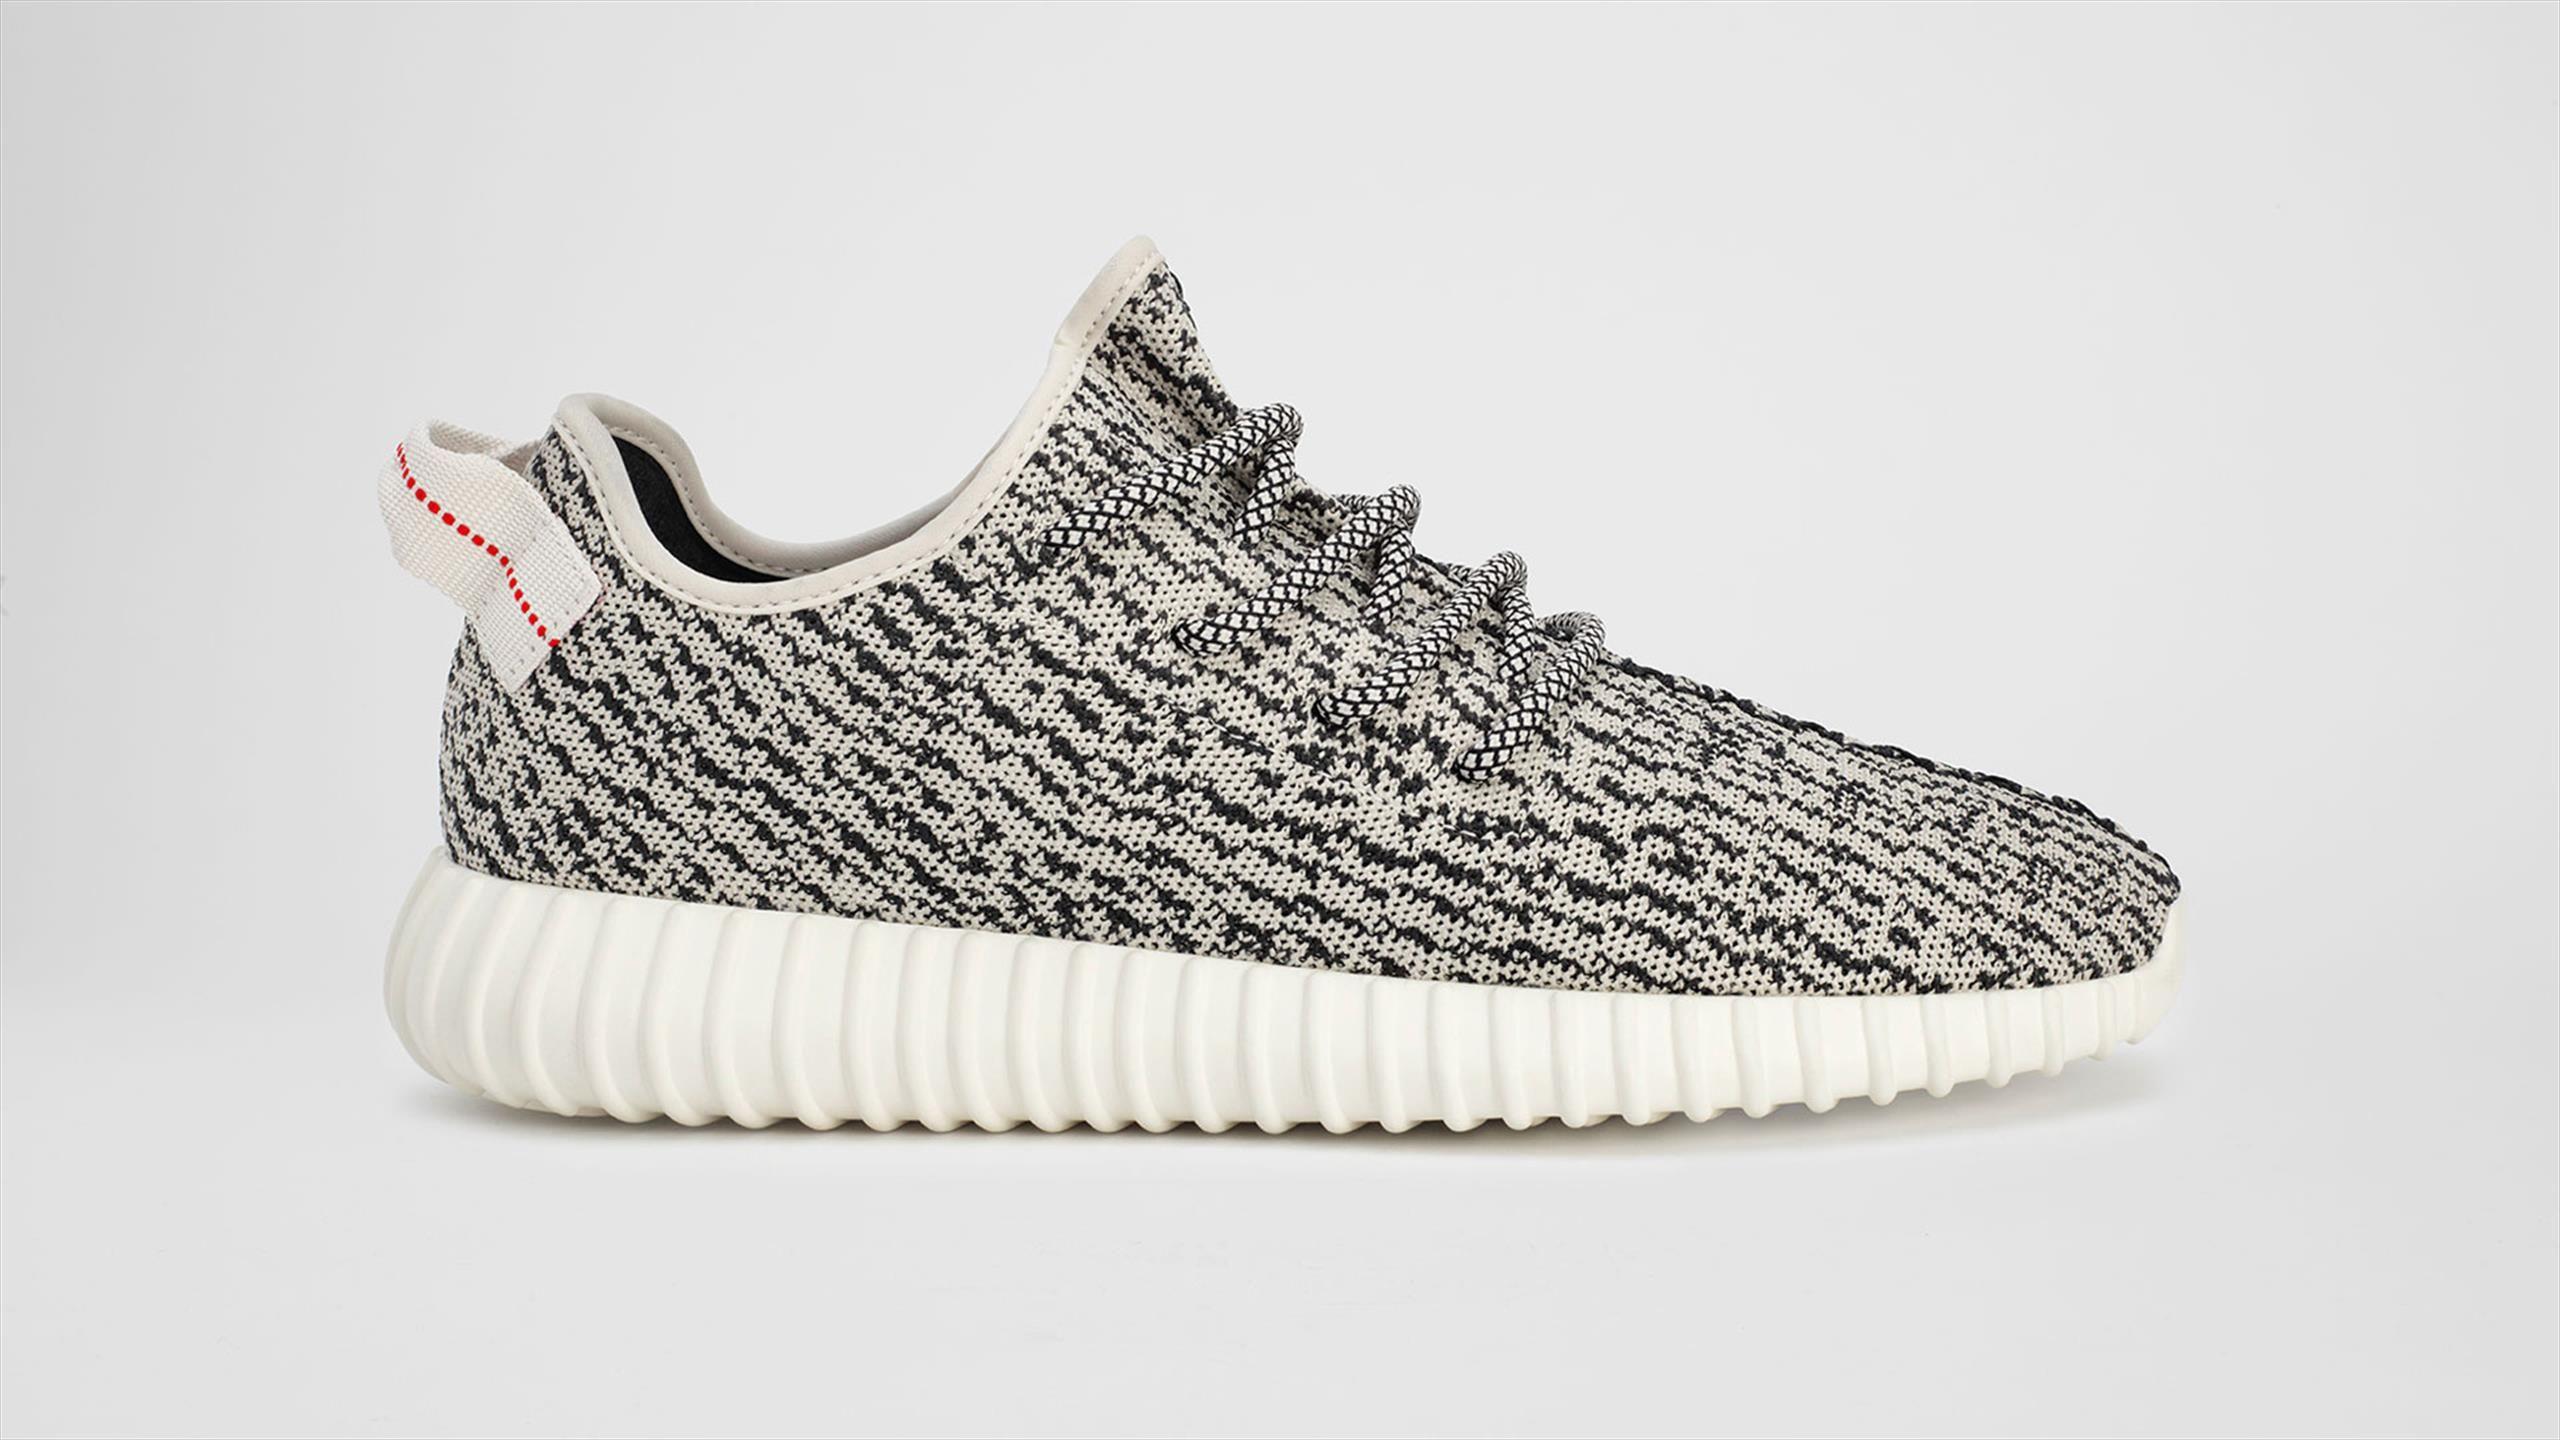 Kanye Chaussure West Acheter Adidas Pas Cher q17wREPx c984dca04b6